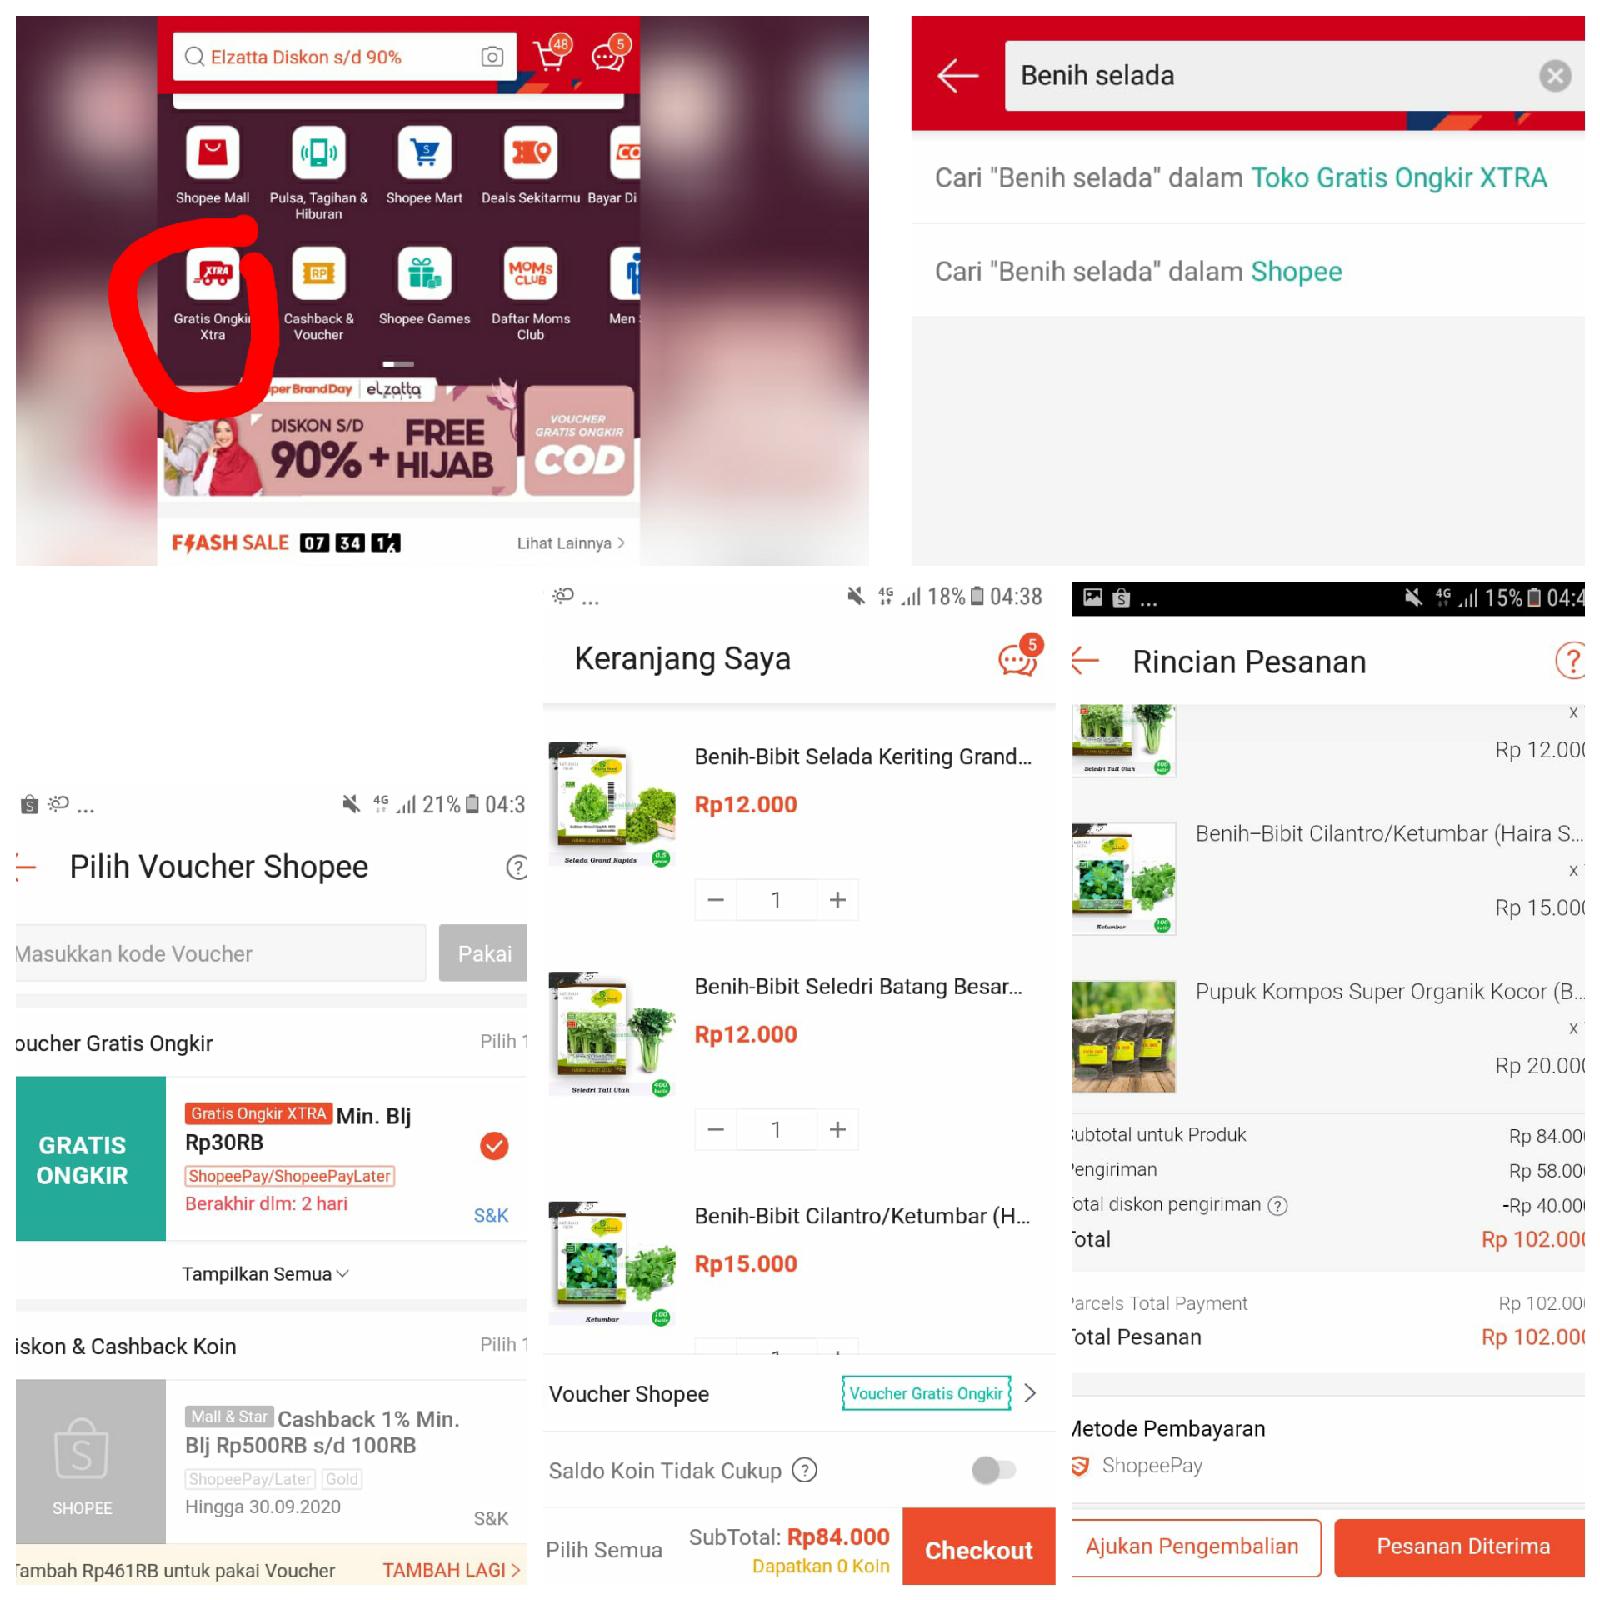 Mengulas Gratis Ongkir Xtra Shopee Arti Kelebihan Kekurangan Syarat Ketentuan Dan Cara Menggunakan Konsumen Digital